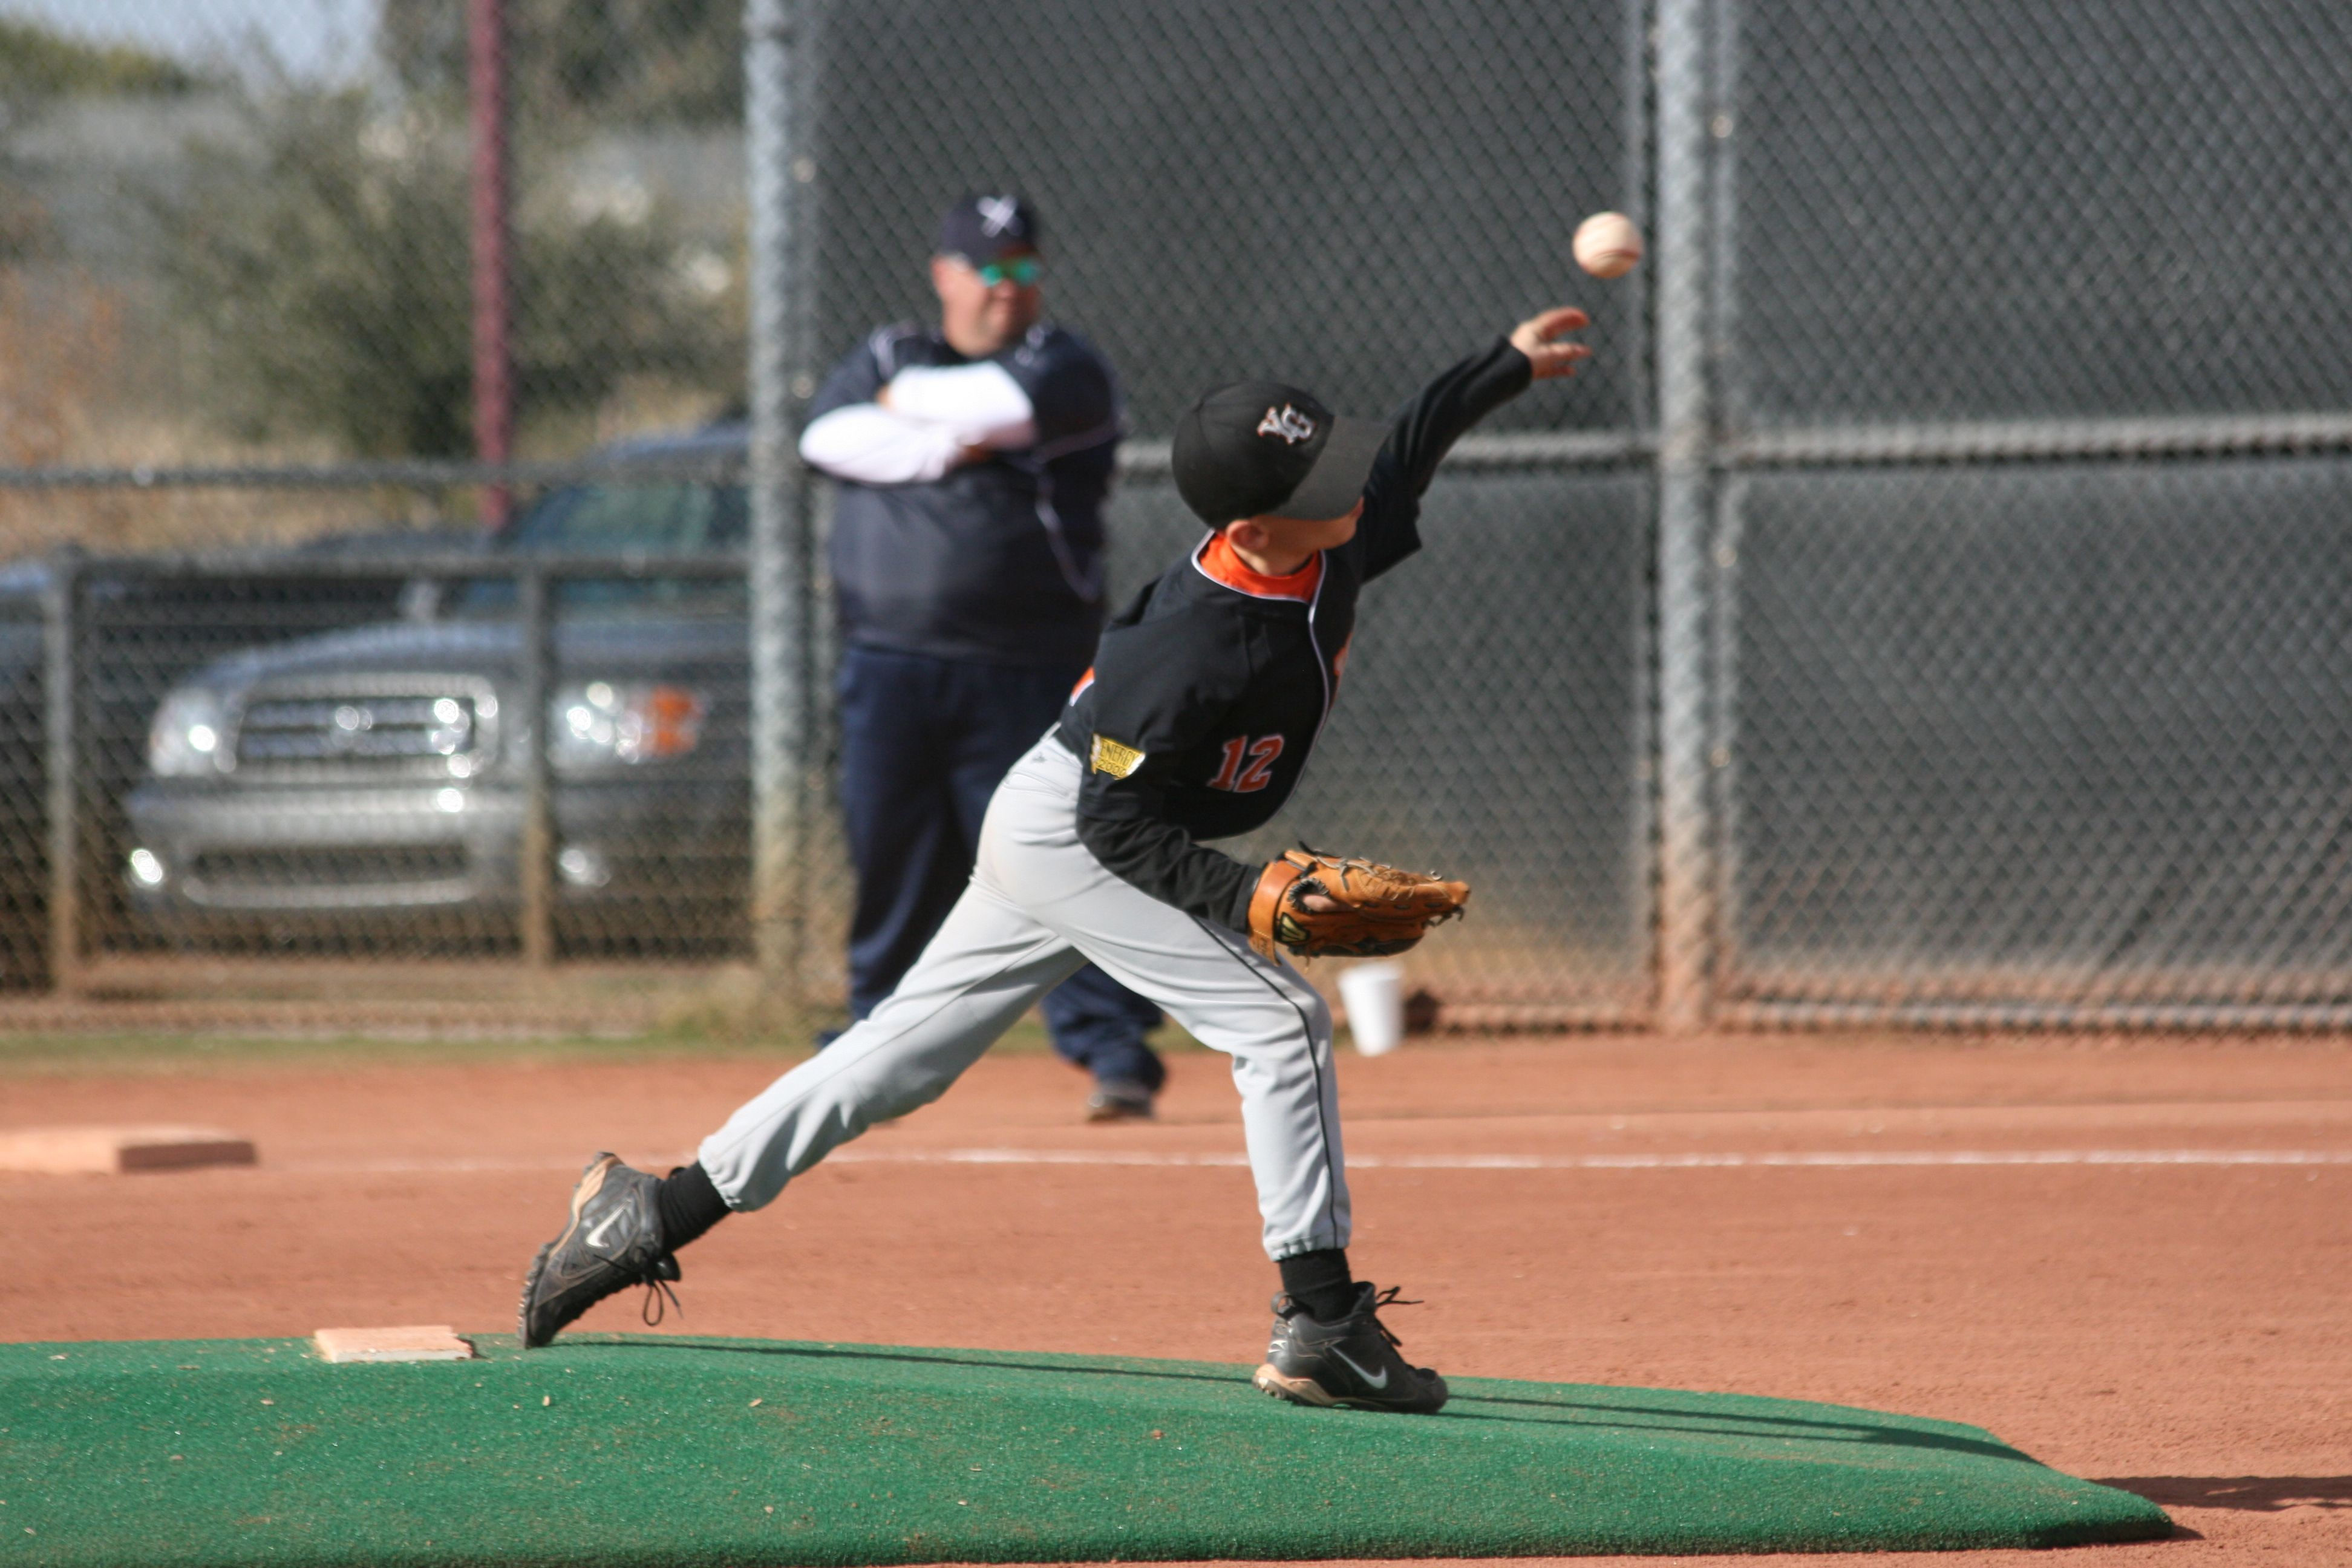 Baseball- my son